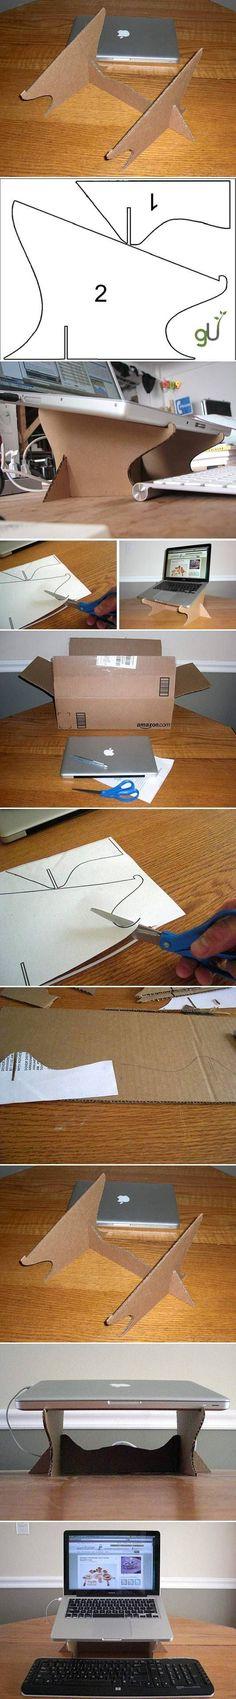 DIY Simple Cardboard Laptop Stand: